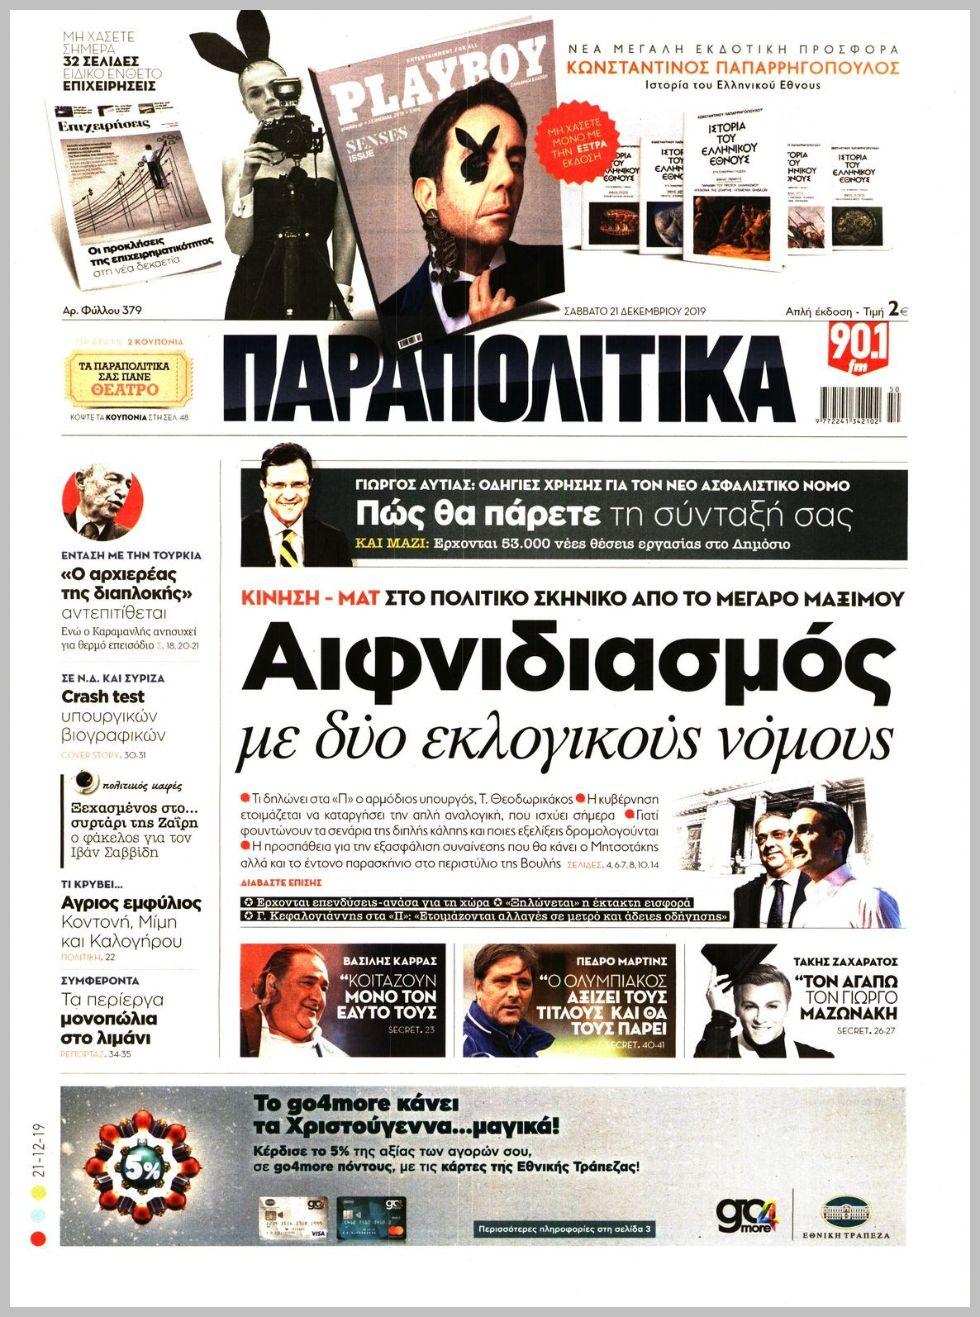 https://protoselida.24media.gr/images/2019/12/21/lrg/20191221_parapolitika_0343.jpg